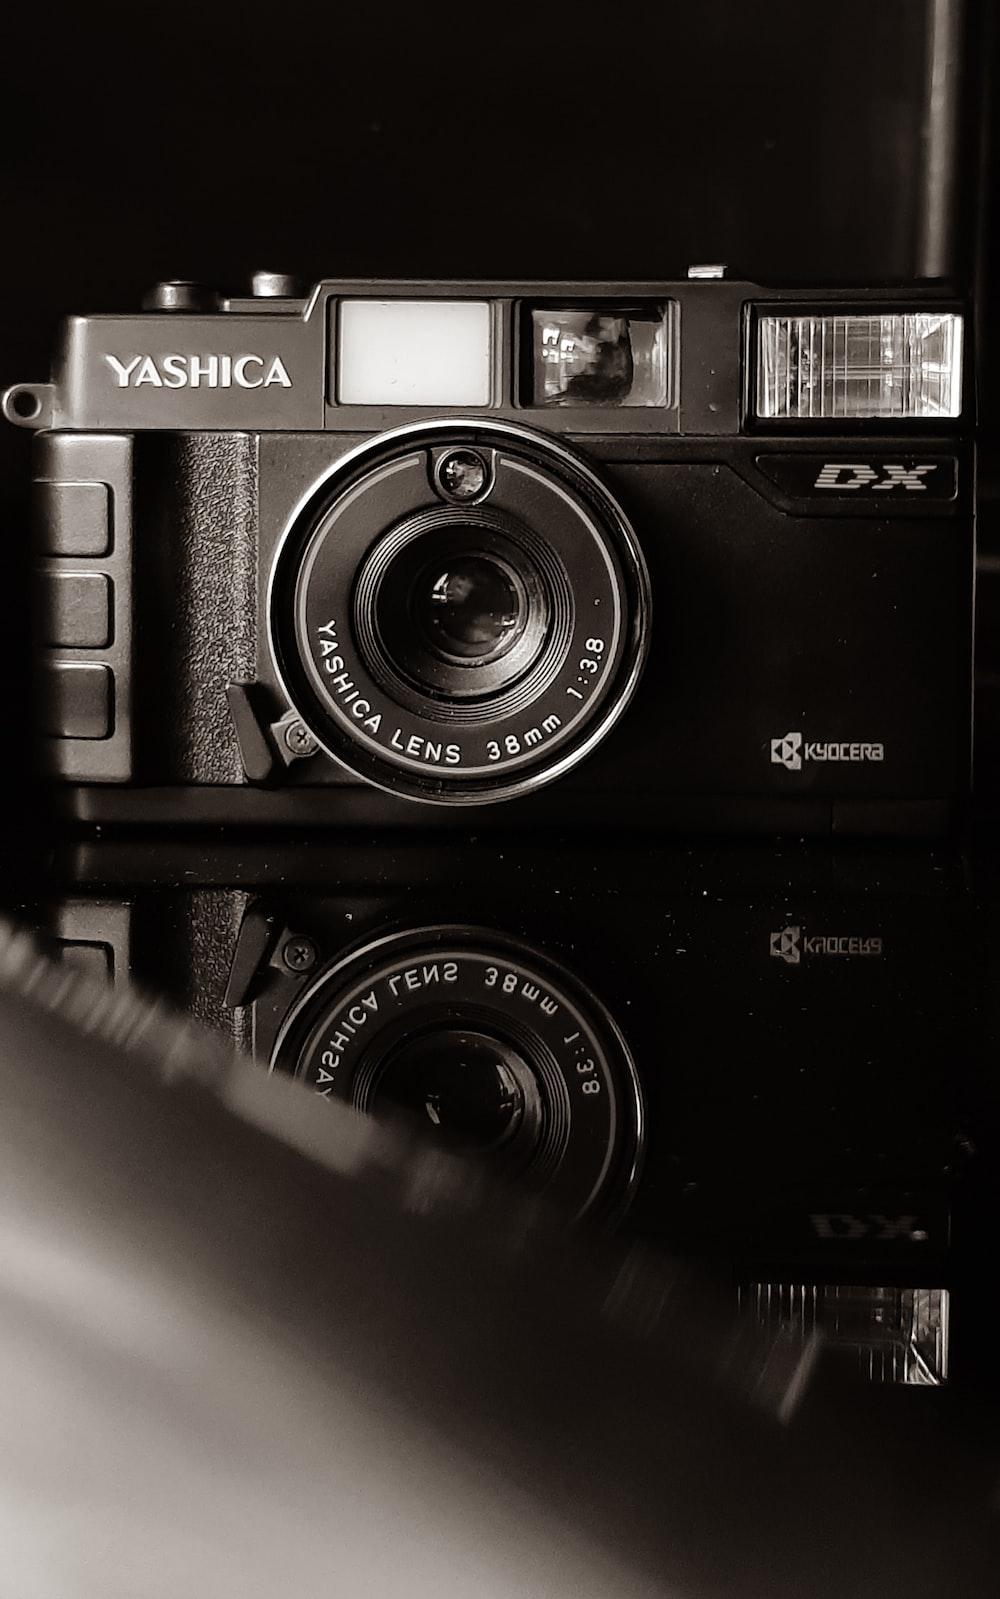 black and silver olympus camera